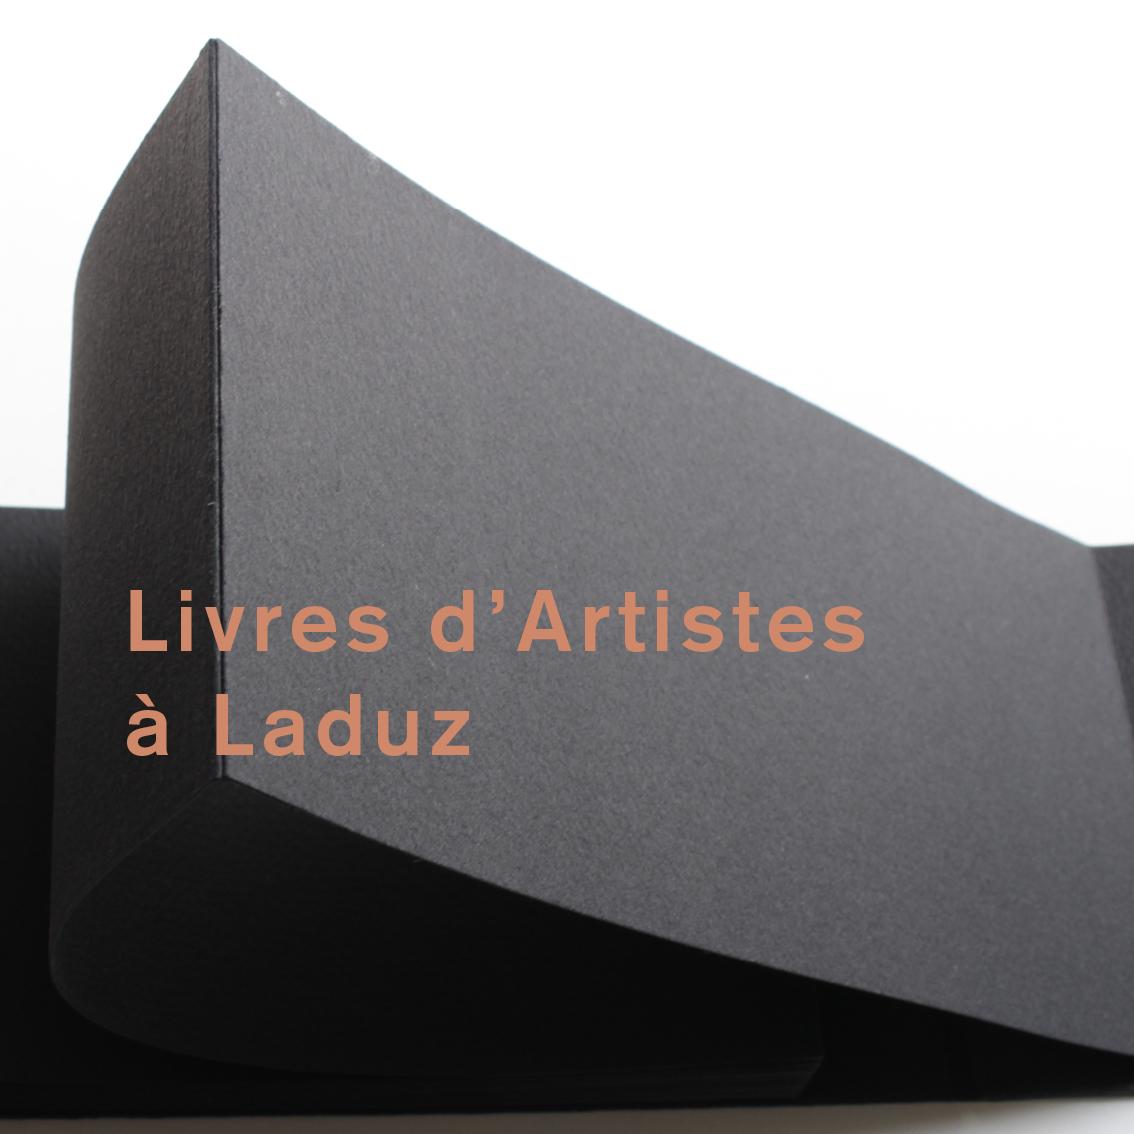 Livres d'artistes - exposition